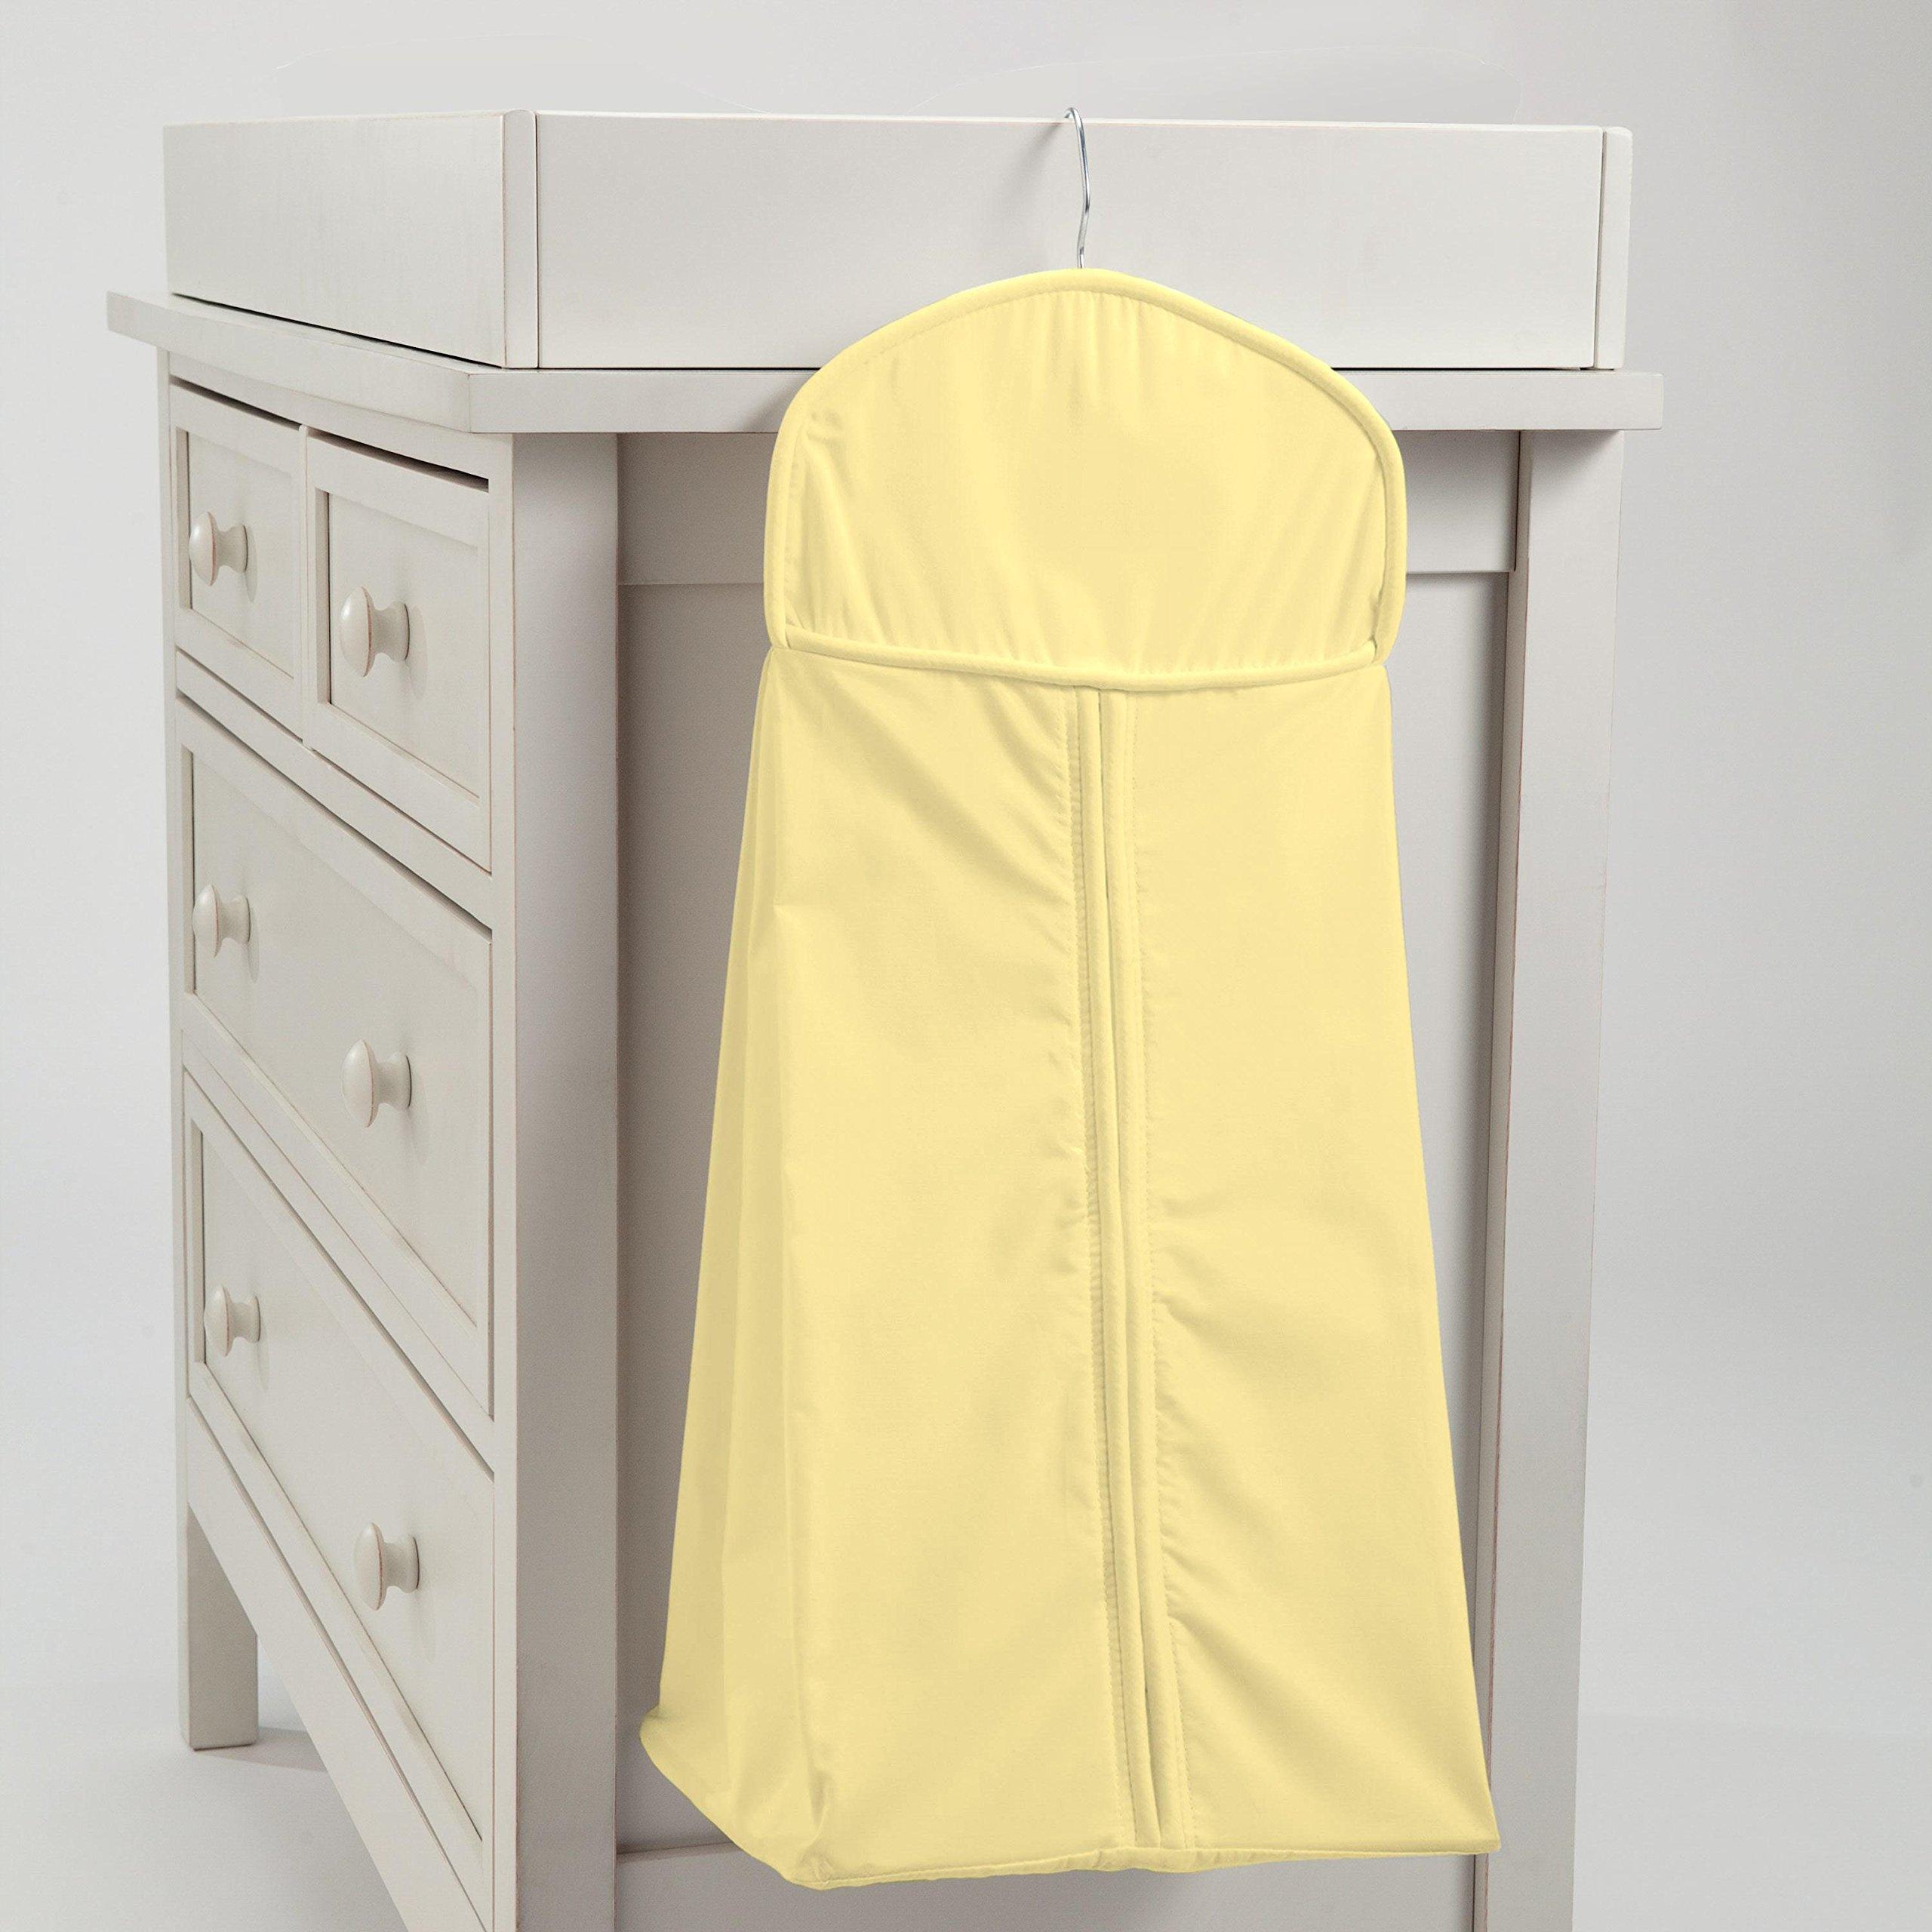 Carousel Designs Solid Banana Diaper Stacker